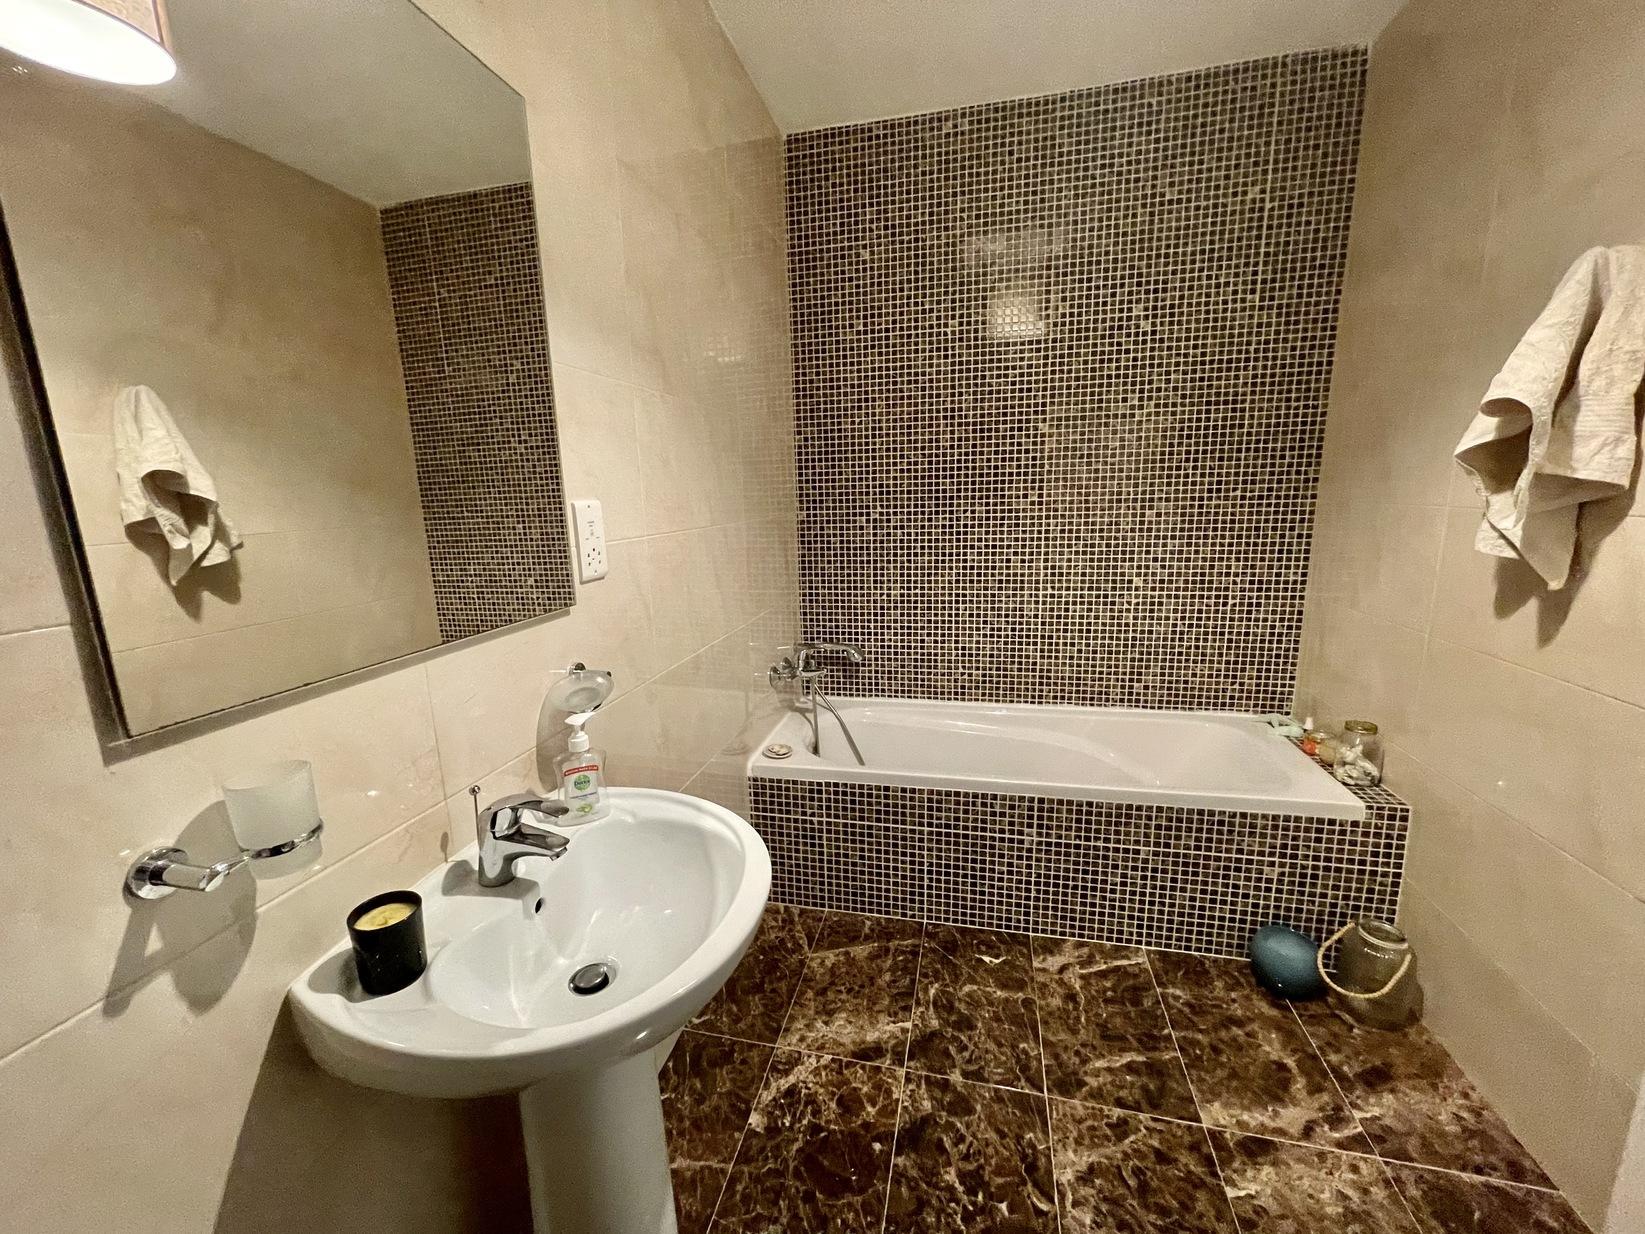 3 bed Apartment For Rent in Bahar Ic-Caghaq, Bahar ic-Caghaq - thumb 16